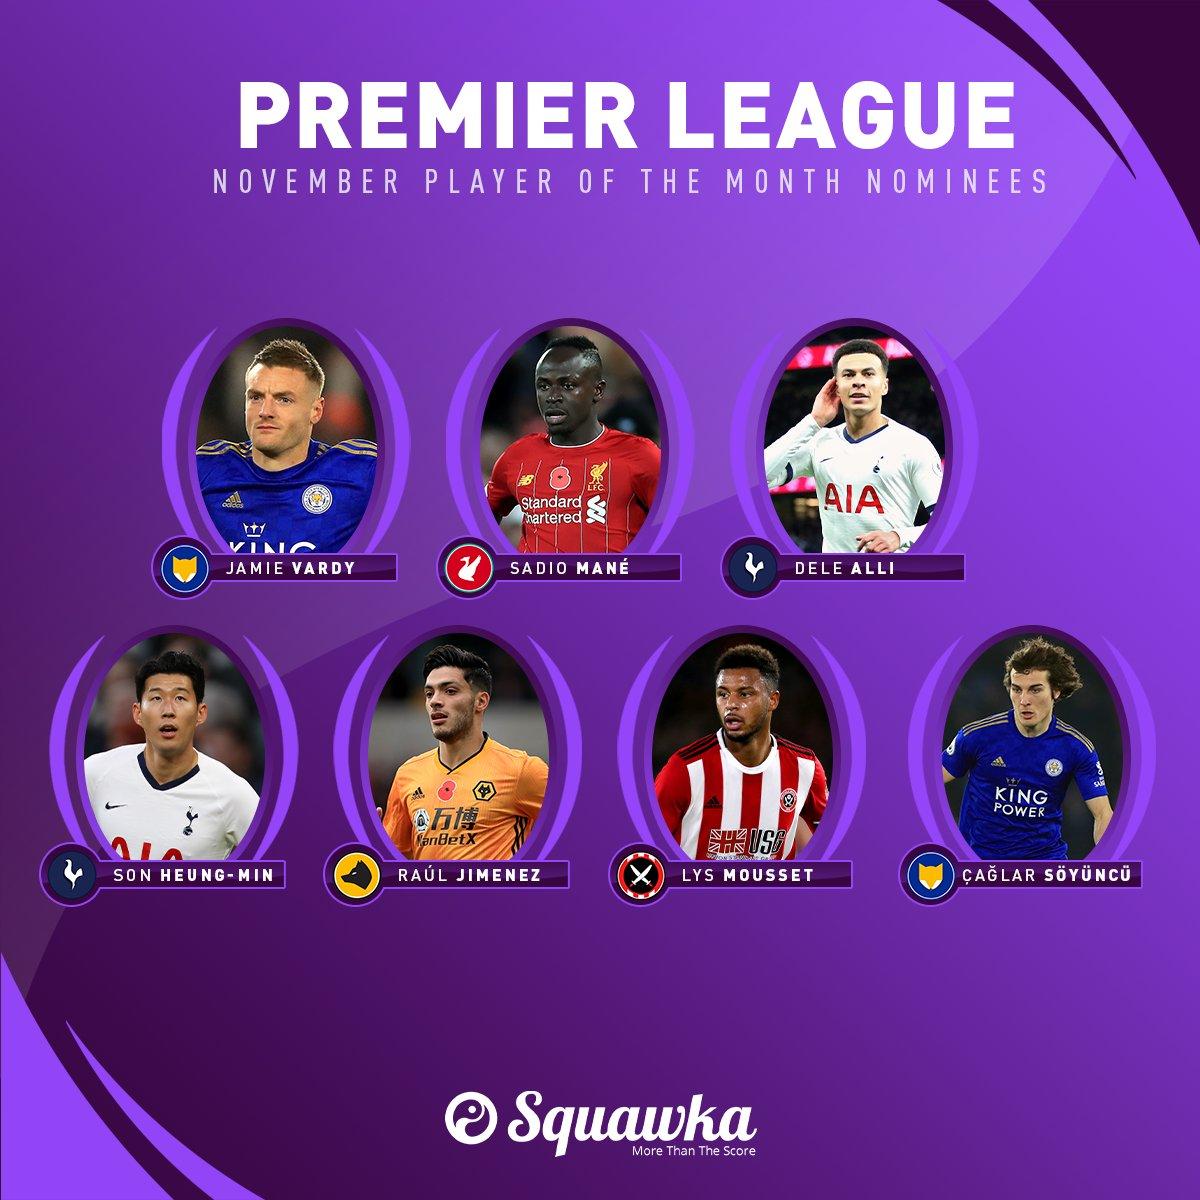 OFFICIAL: The Premier League November Player of the Month nominees: 🏴 Jamie Vardy 🇸🇳 Sadio Mané 🏴 Dele Alli 🇰🇷 Son Heung-min 🇲🇽 Raúl Jimenez 🇫🇷 Lys Mousset 🇹🇷 Çağlar Söyüncü Who are you backing to win?